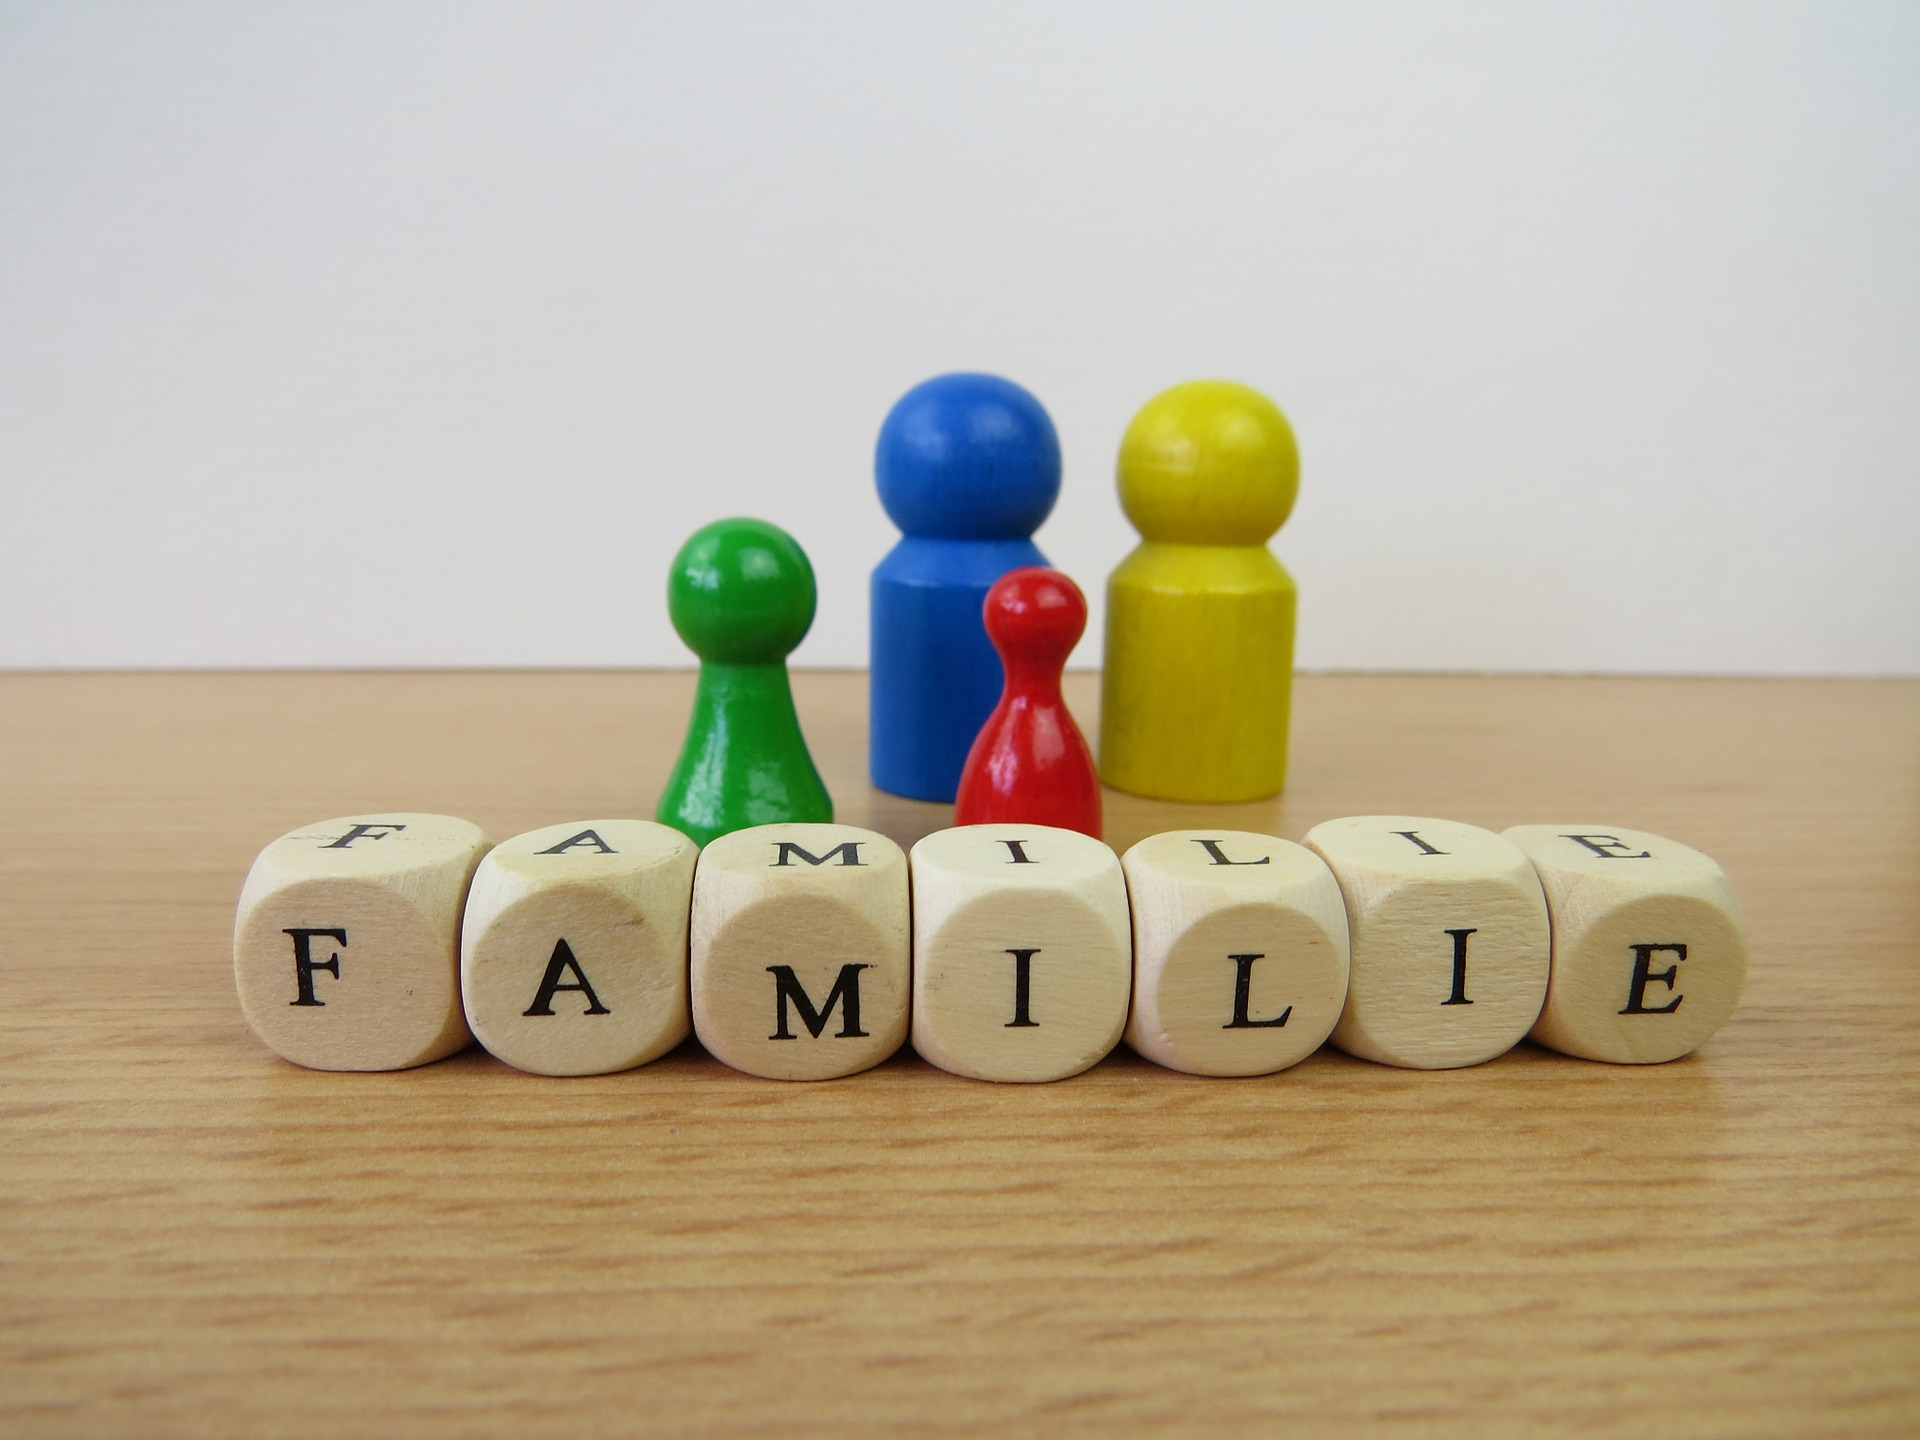 family-658453_1920